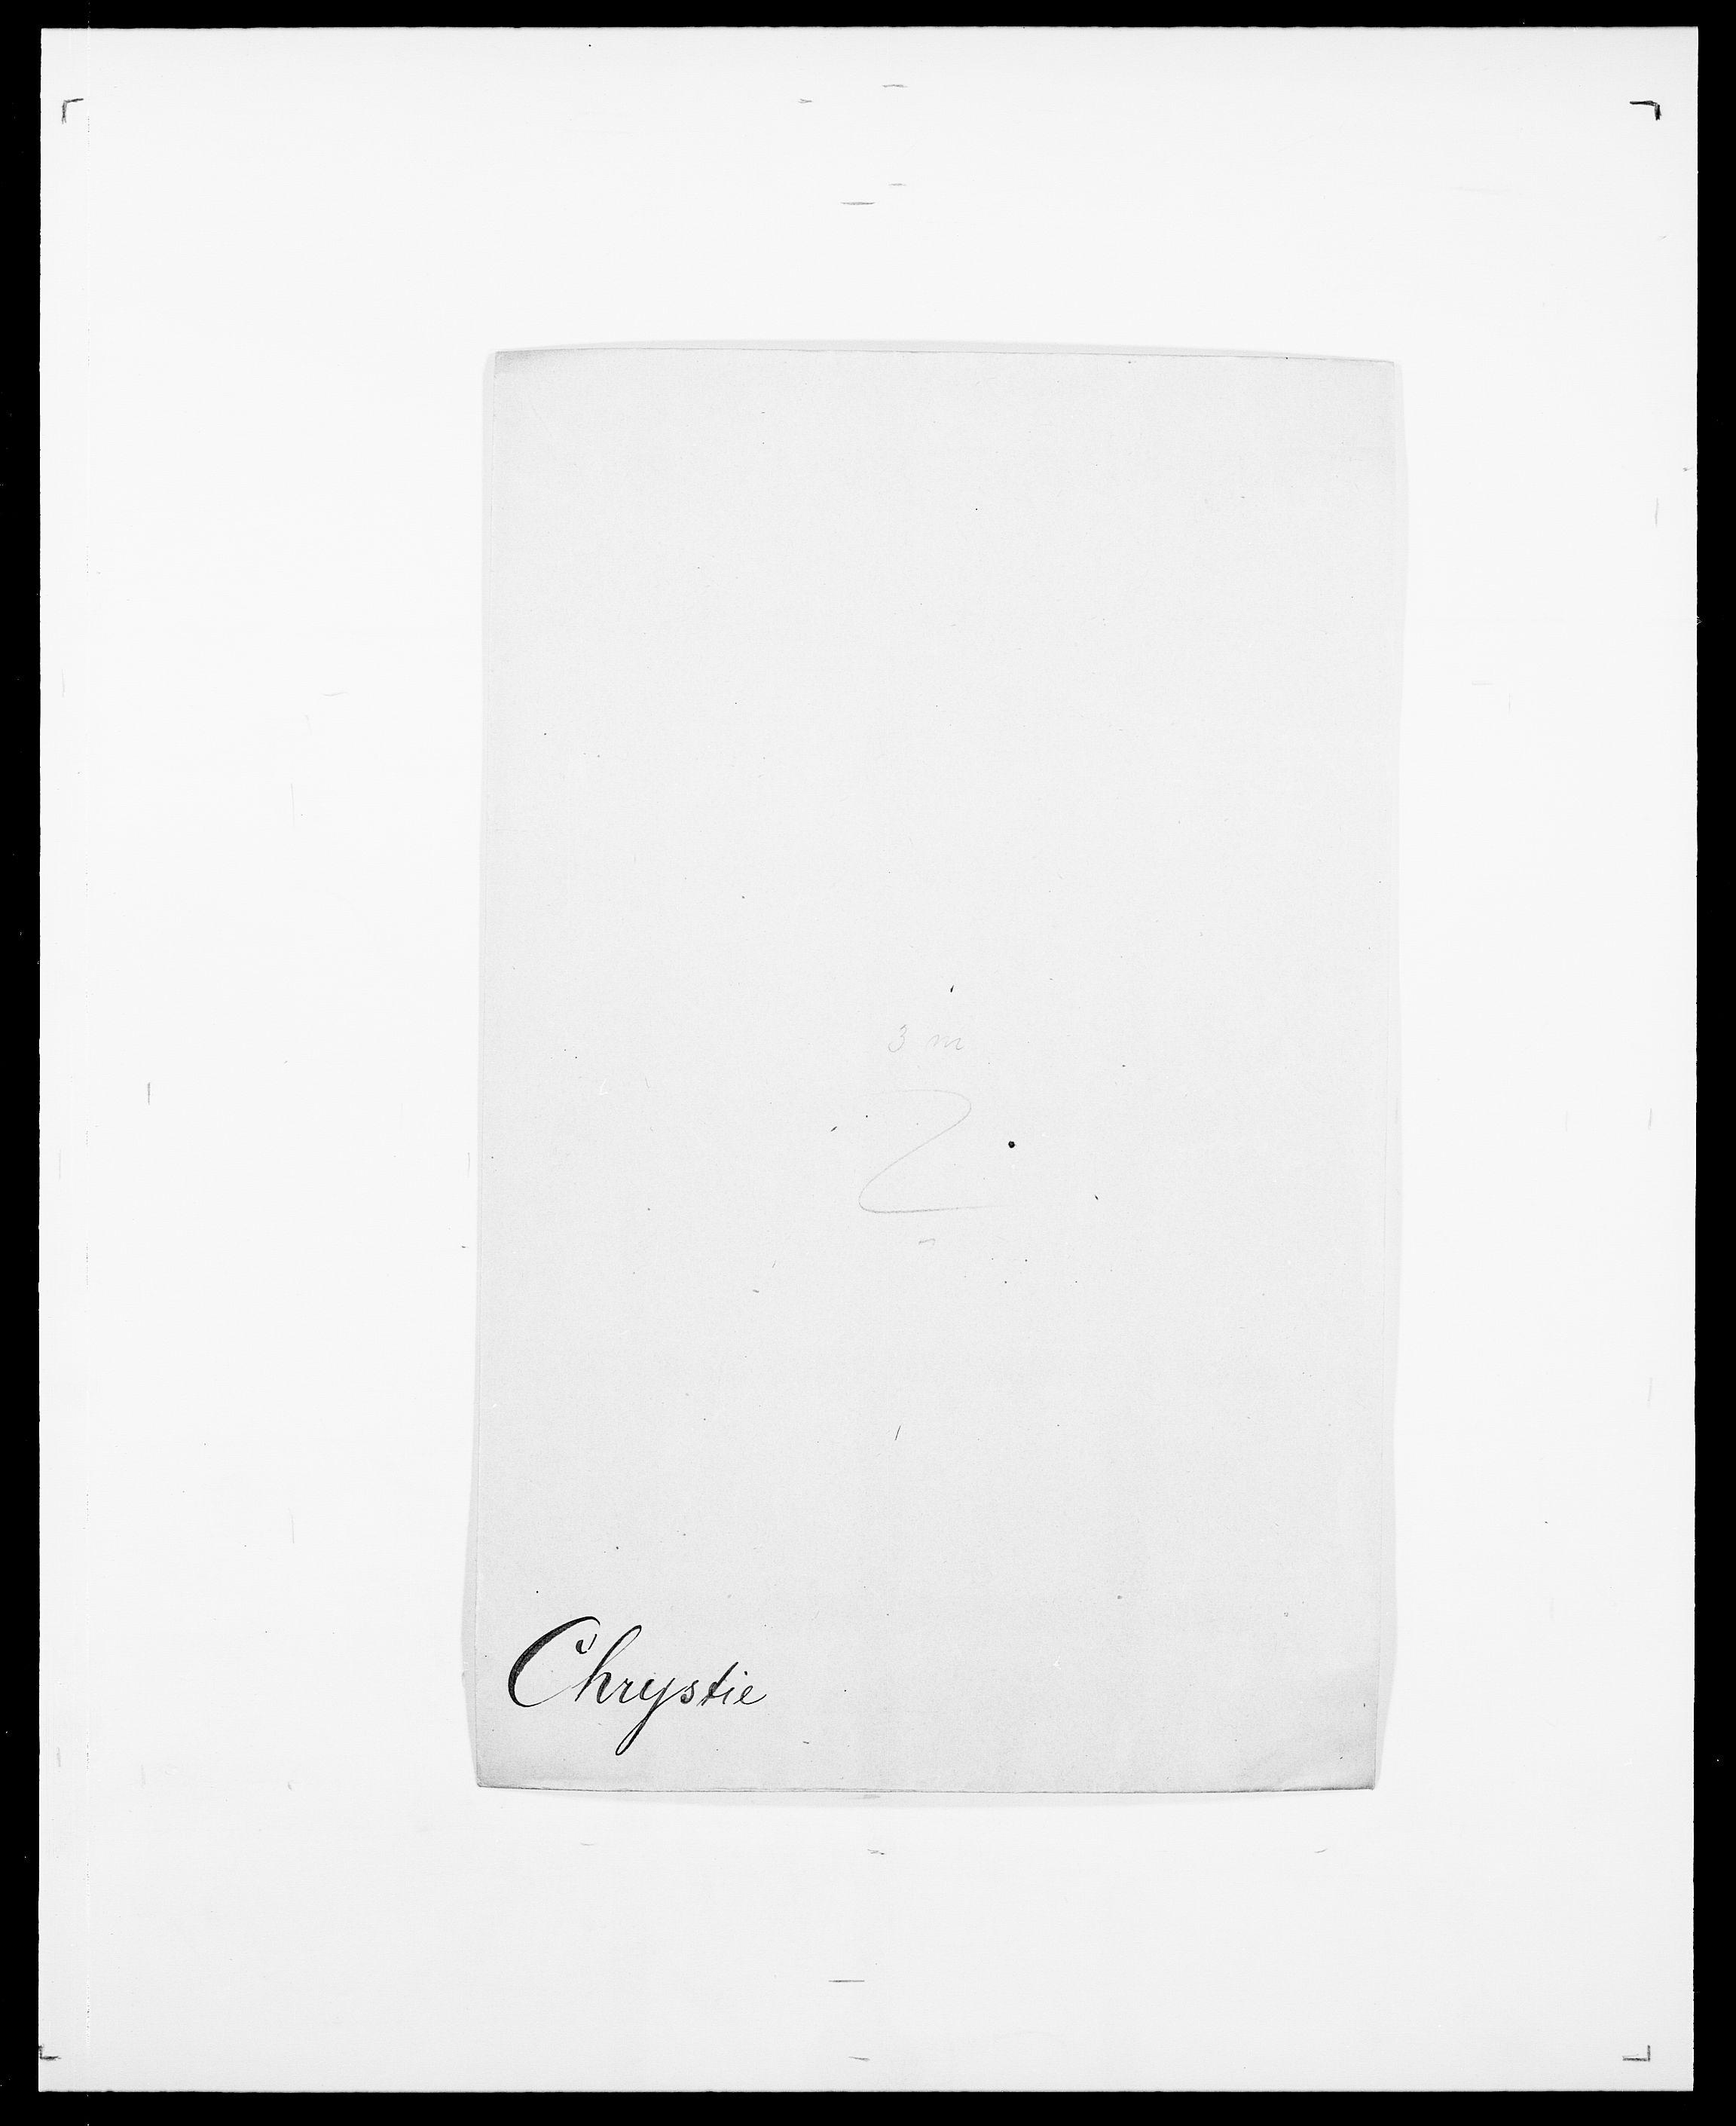 SAO, Delgobe, Charles Antoine - samling, D/Da/L0008: Capjon - Dagenbolt, s. 295